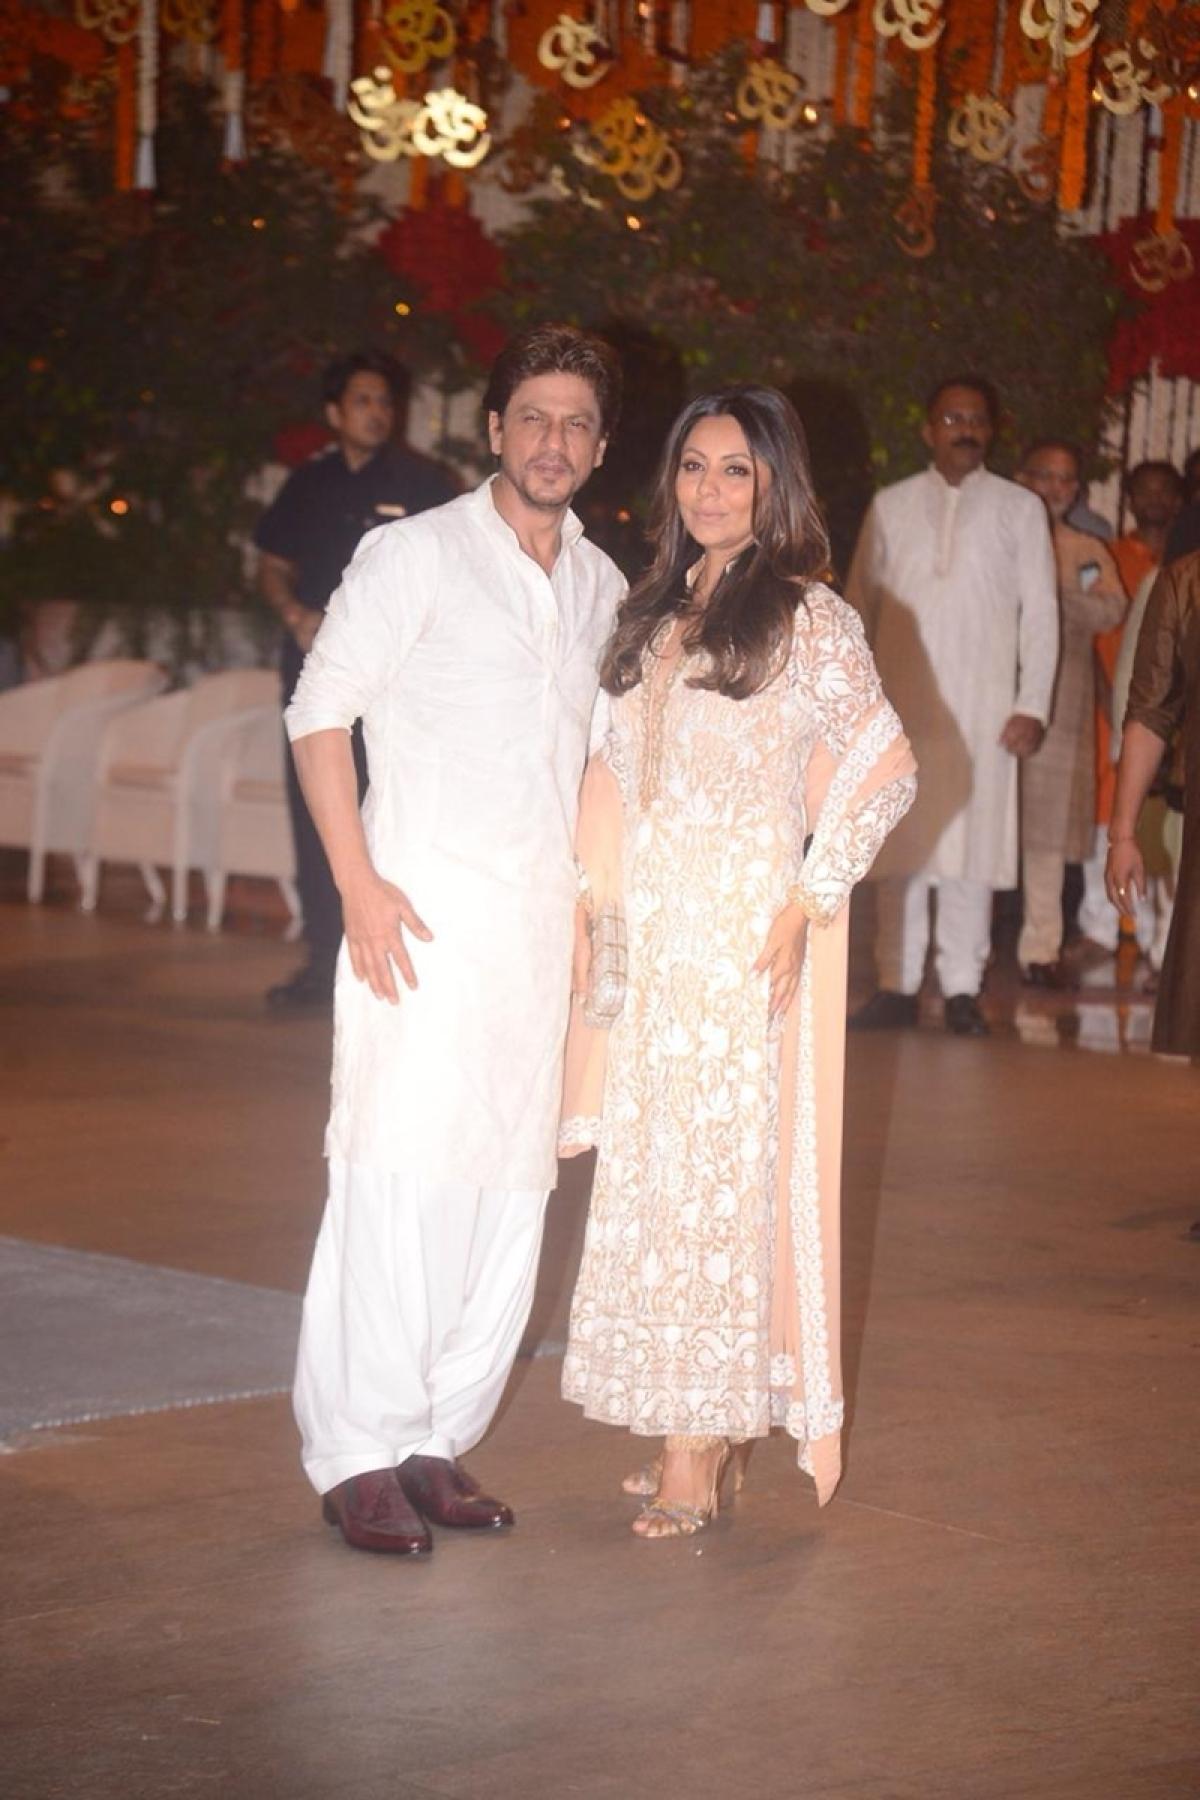 Shah Rukh Khan and his wife Gauri Khan at Mukesh Ambani's house.Photo By: Viral Bhayani